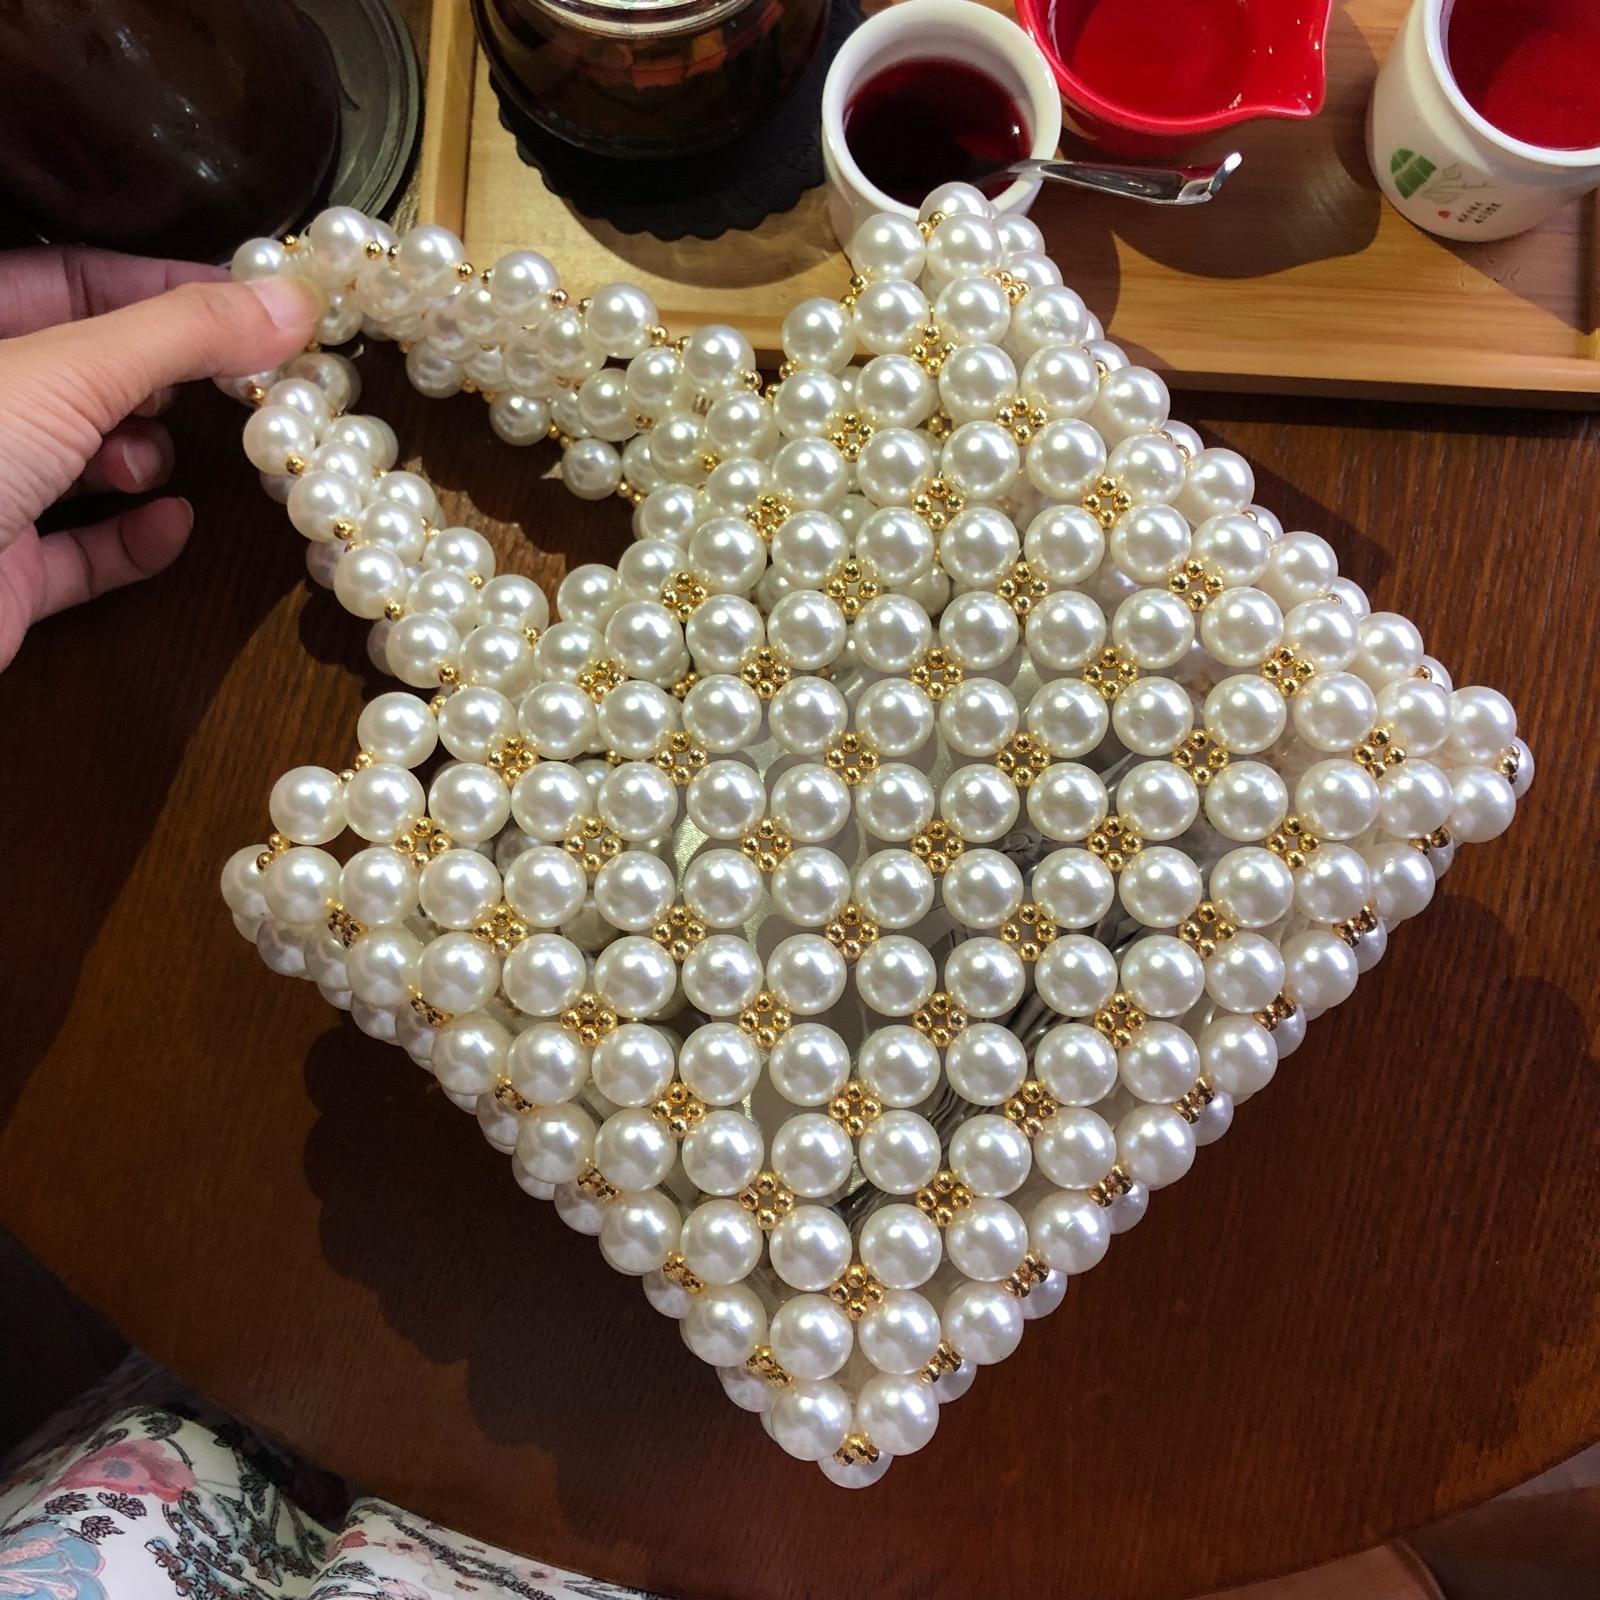 2018 Designer Marque Conception de Niche Le Même Paragraphe Perle Lourd Perles en métal Sac À Main luis vuitton gg sac bolsa feminina vs rose